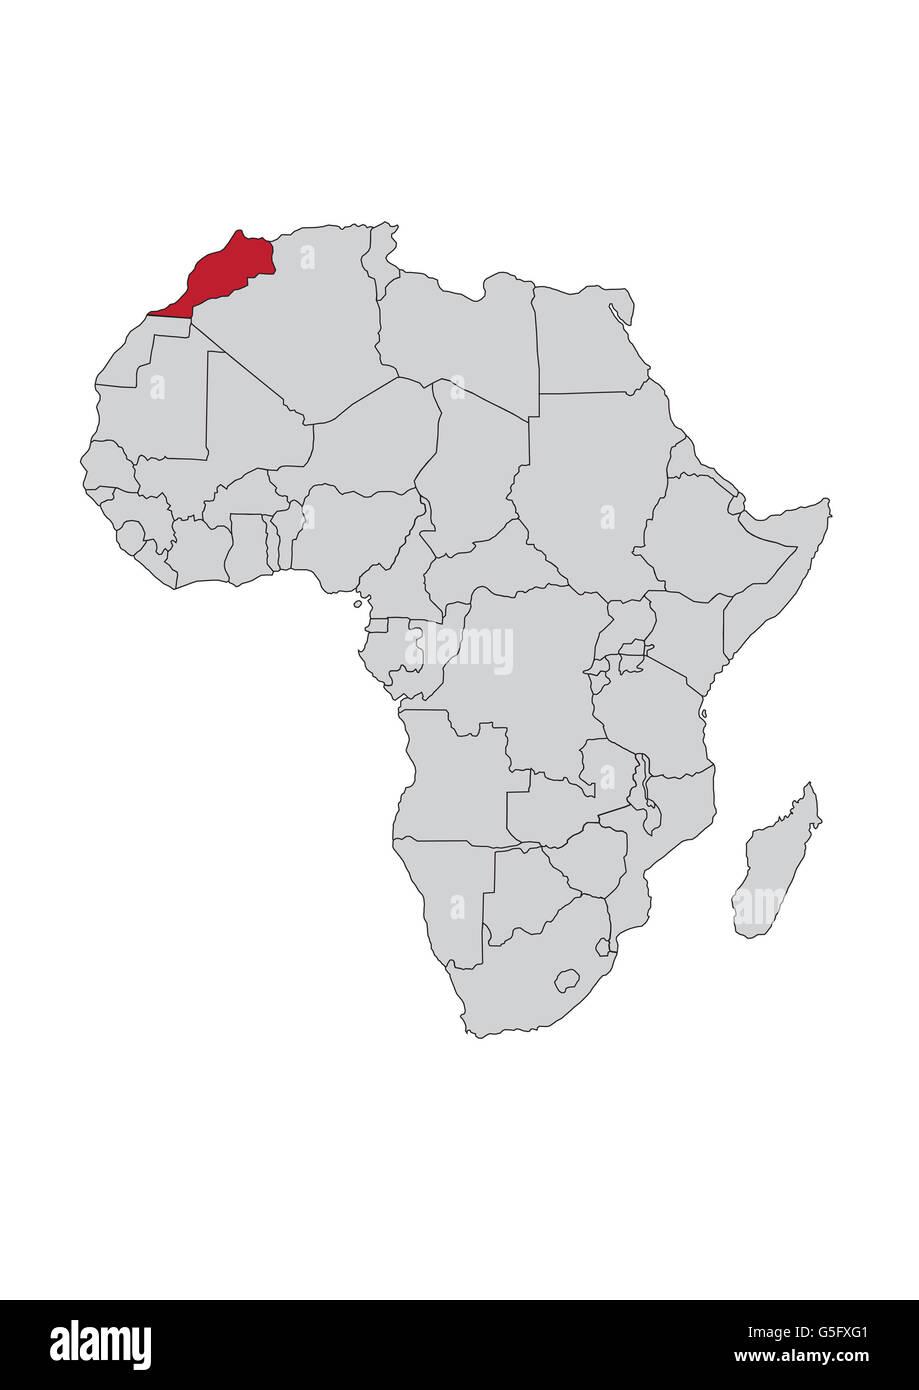 morocco on map of africa Map Of Africa Morocco Stock Photo Alamy morocco on map of africa